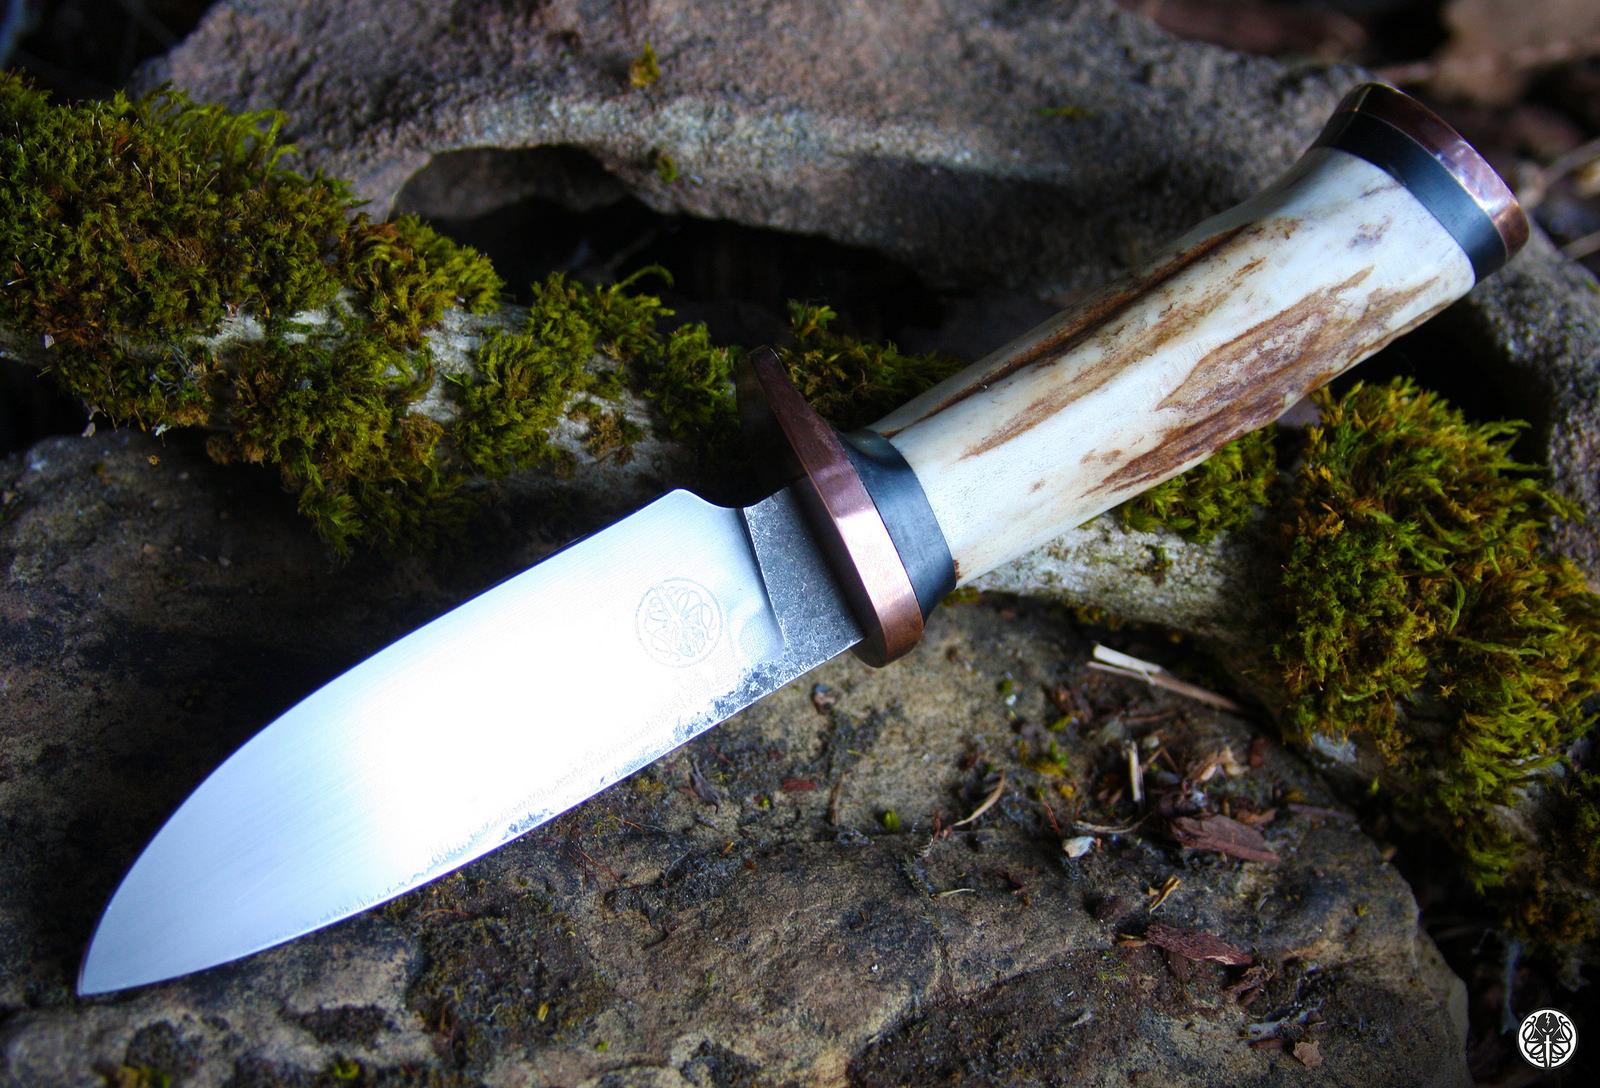 Upside down knife